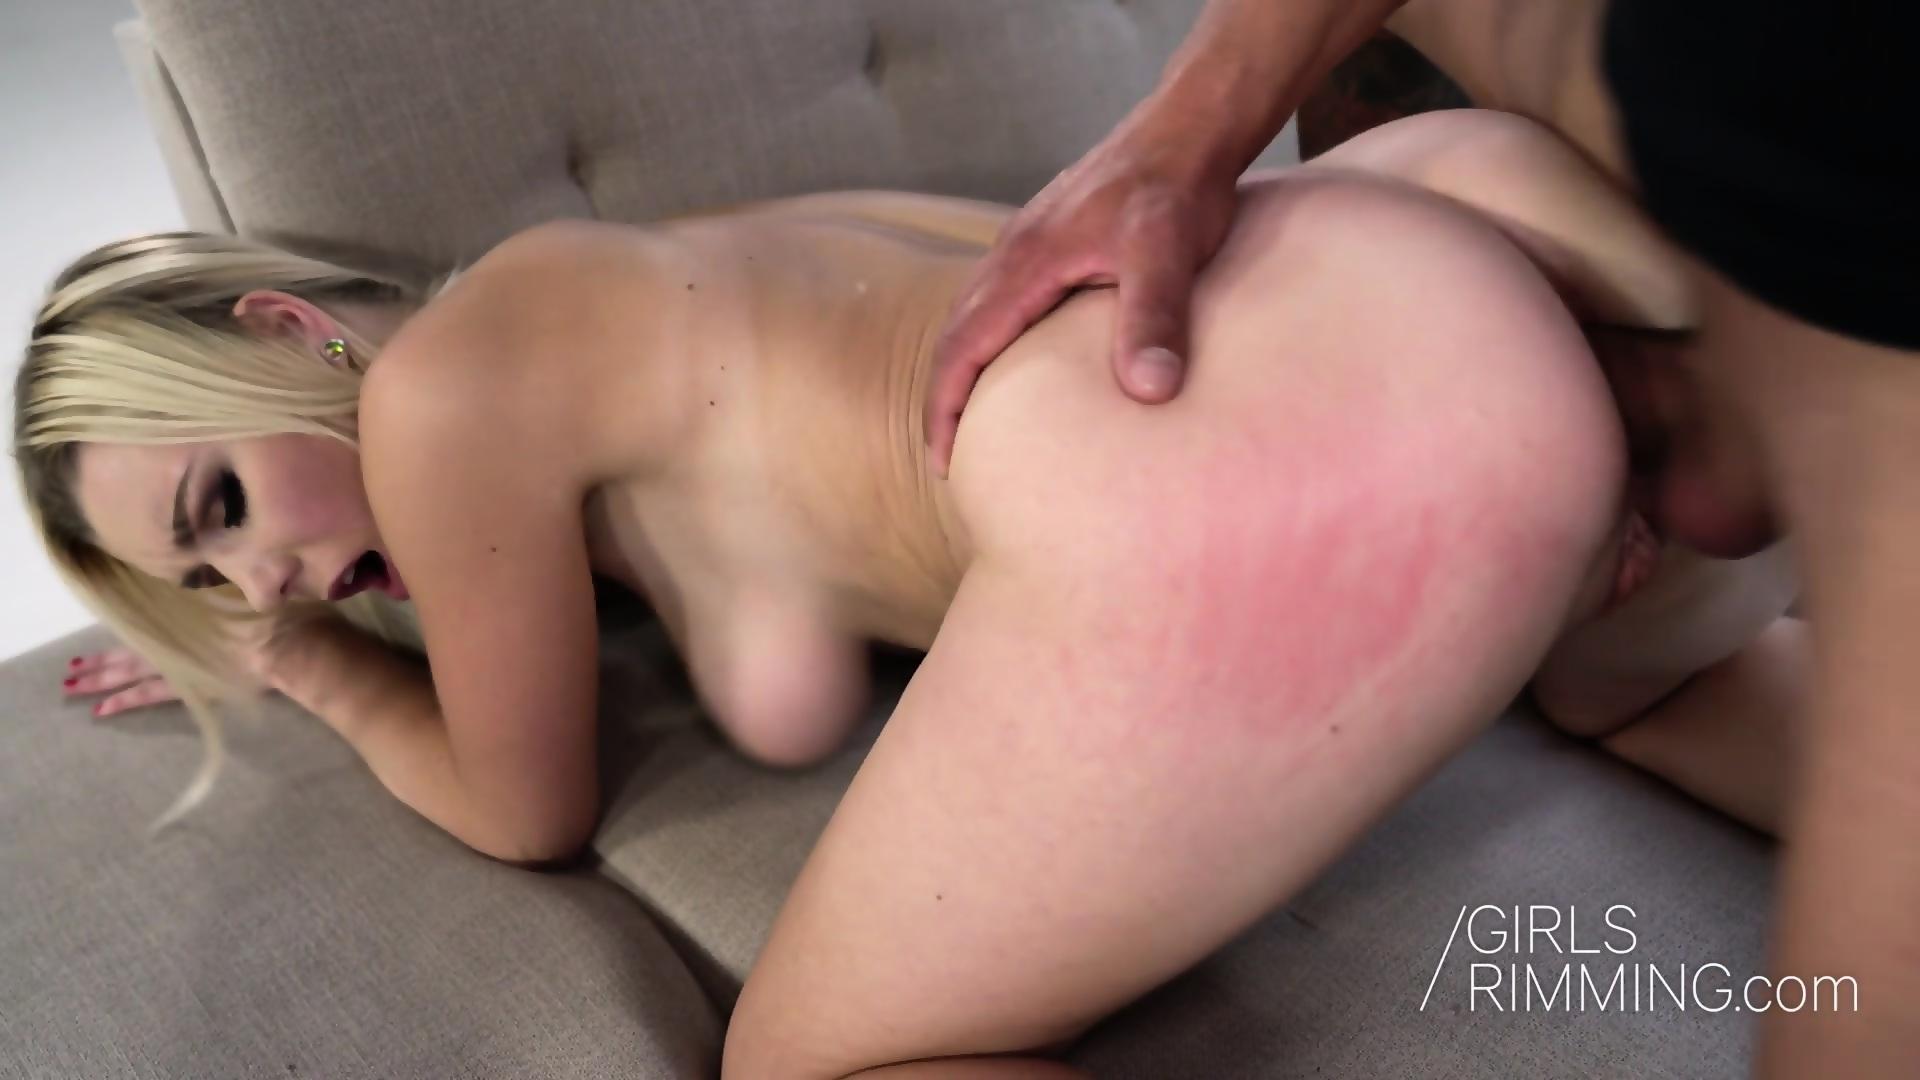 Ass Rimming Porn